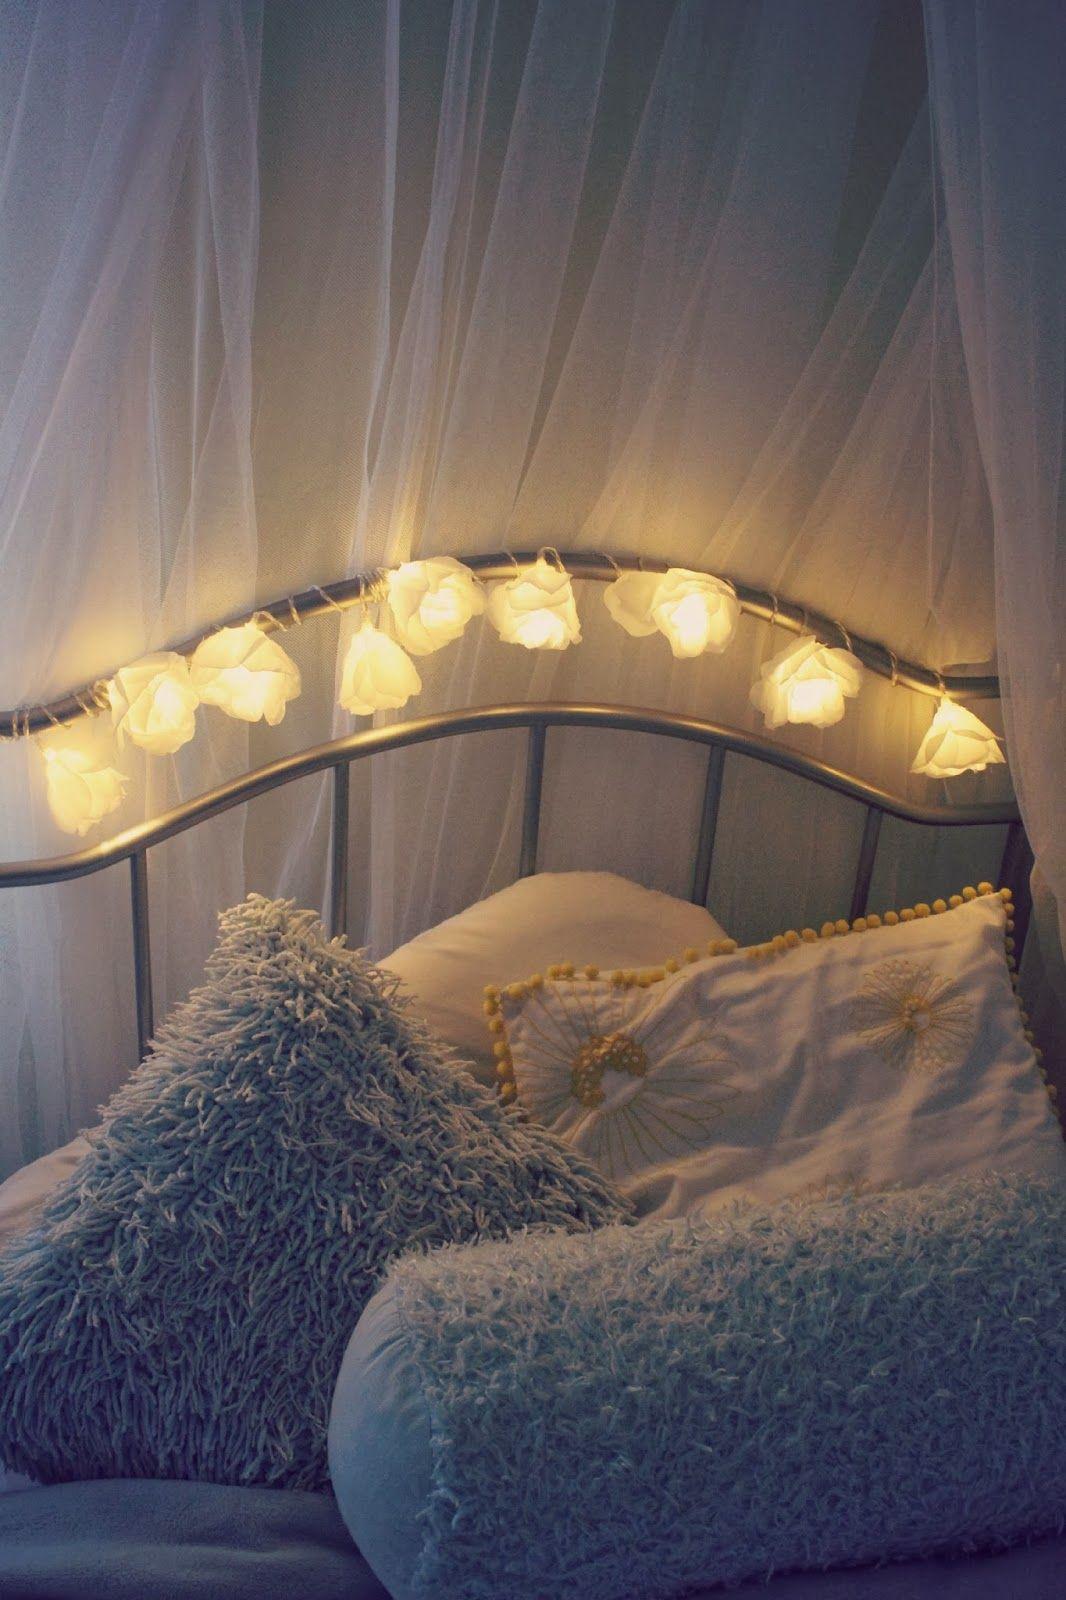 Low Cost Flower Fairy Lights Bedroom Decor Ideainspiration - Flower lights for bedroom